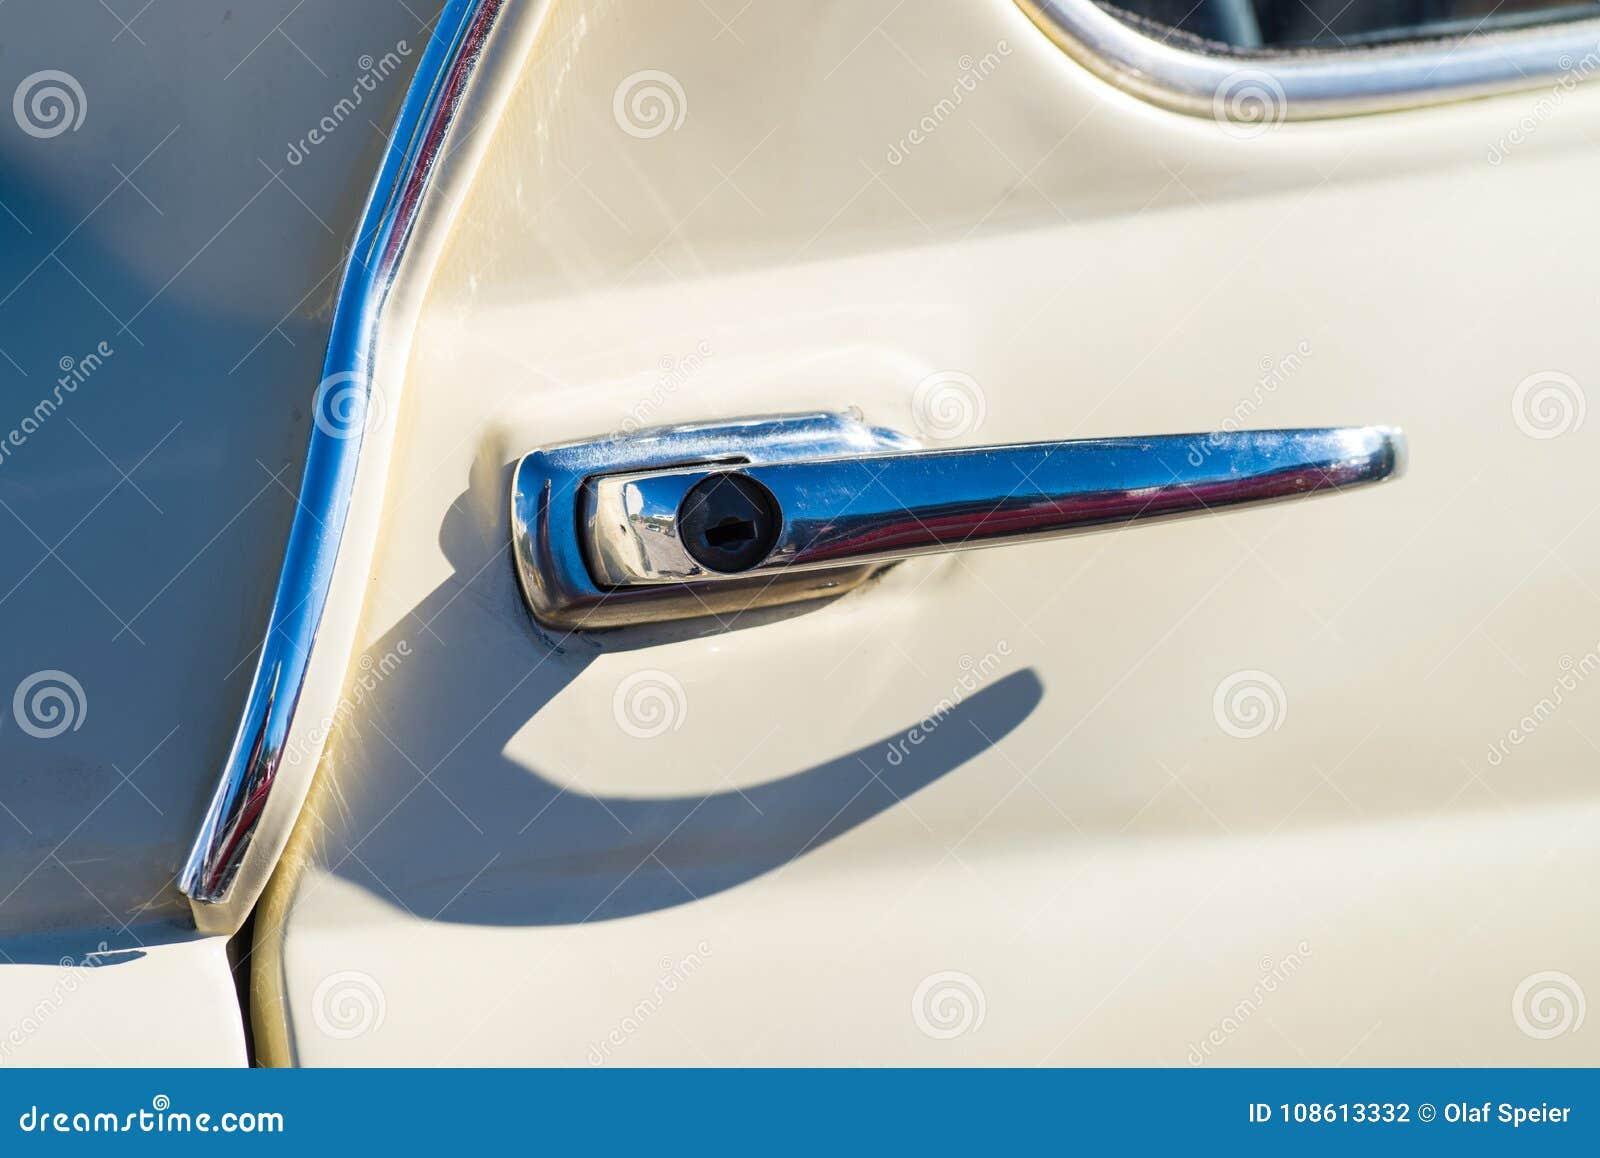 vintage car door handles. Vintage Car Door Handles O